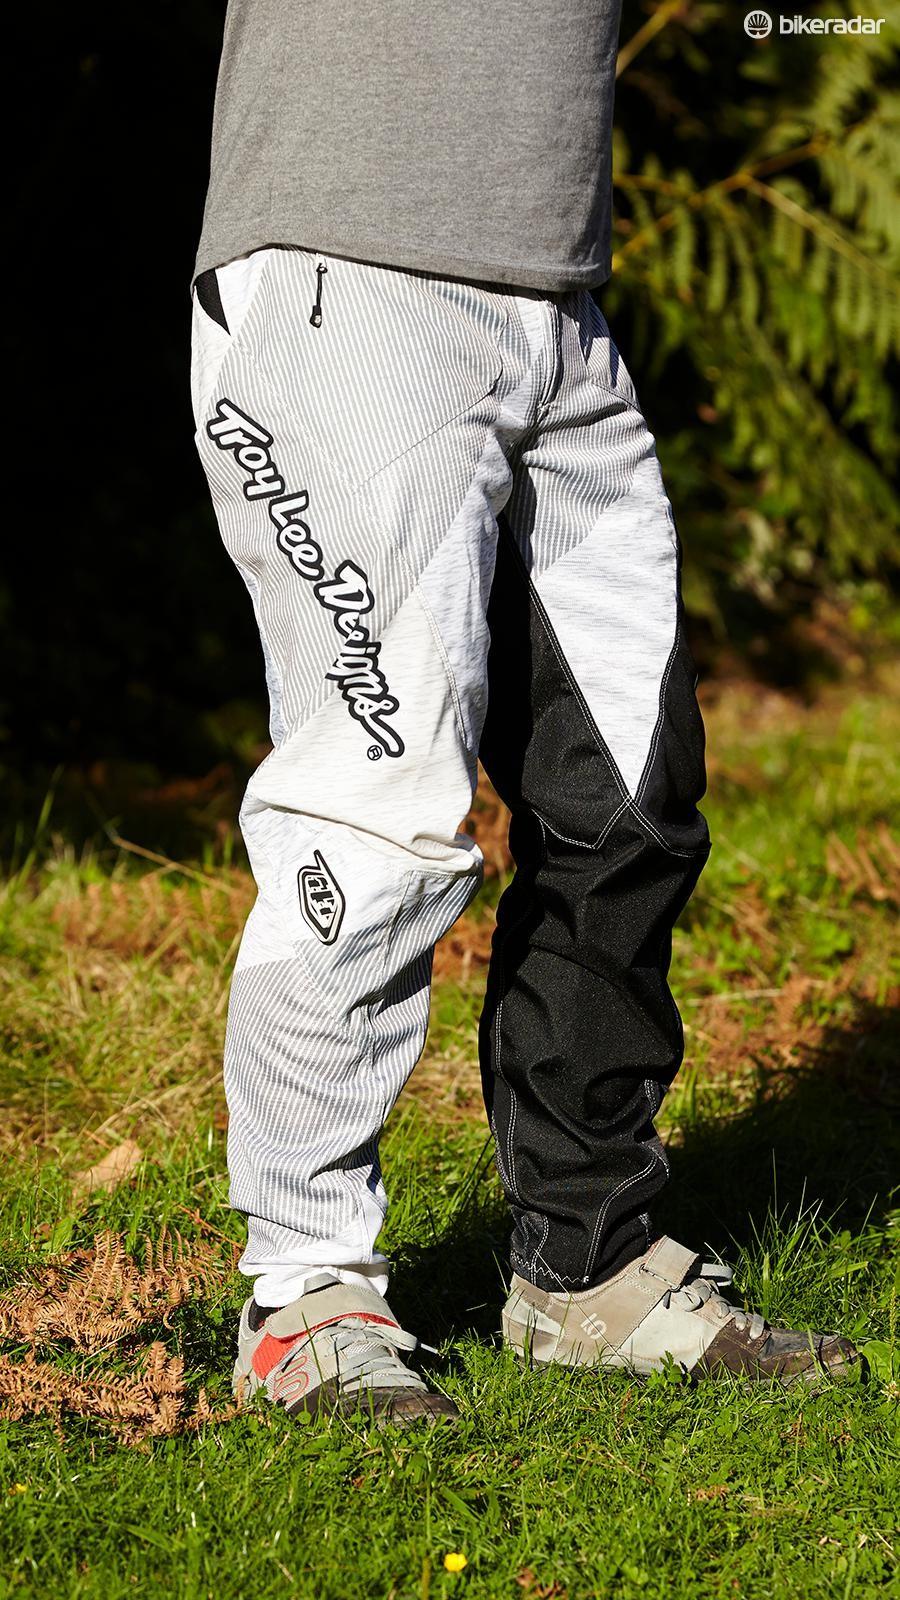 Troy Lee Designs Sprint downhill pants